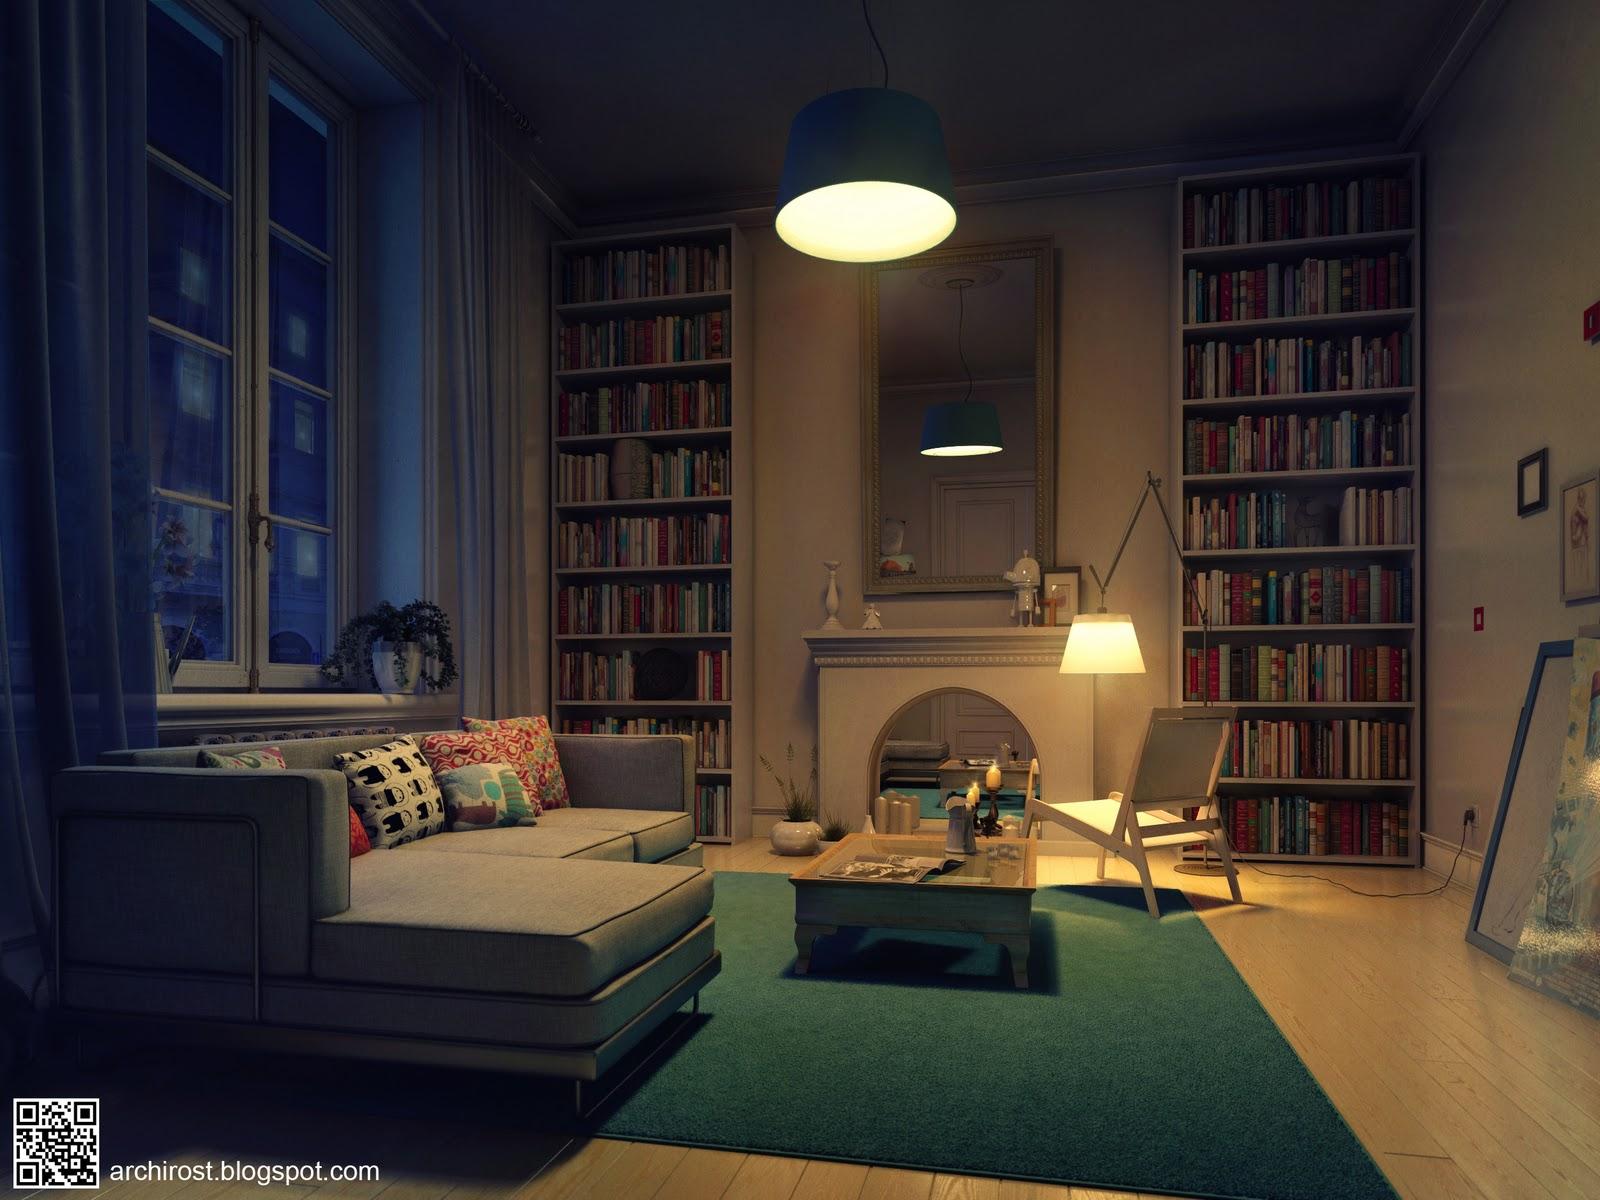 Vray освещение интерьер